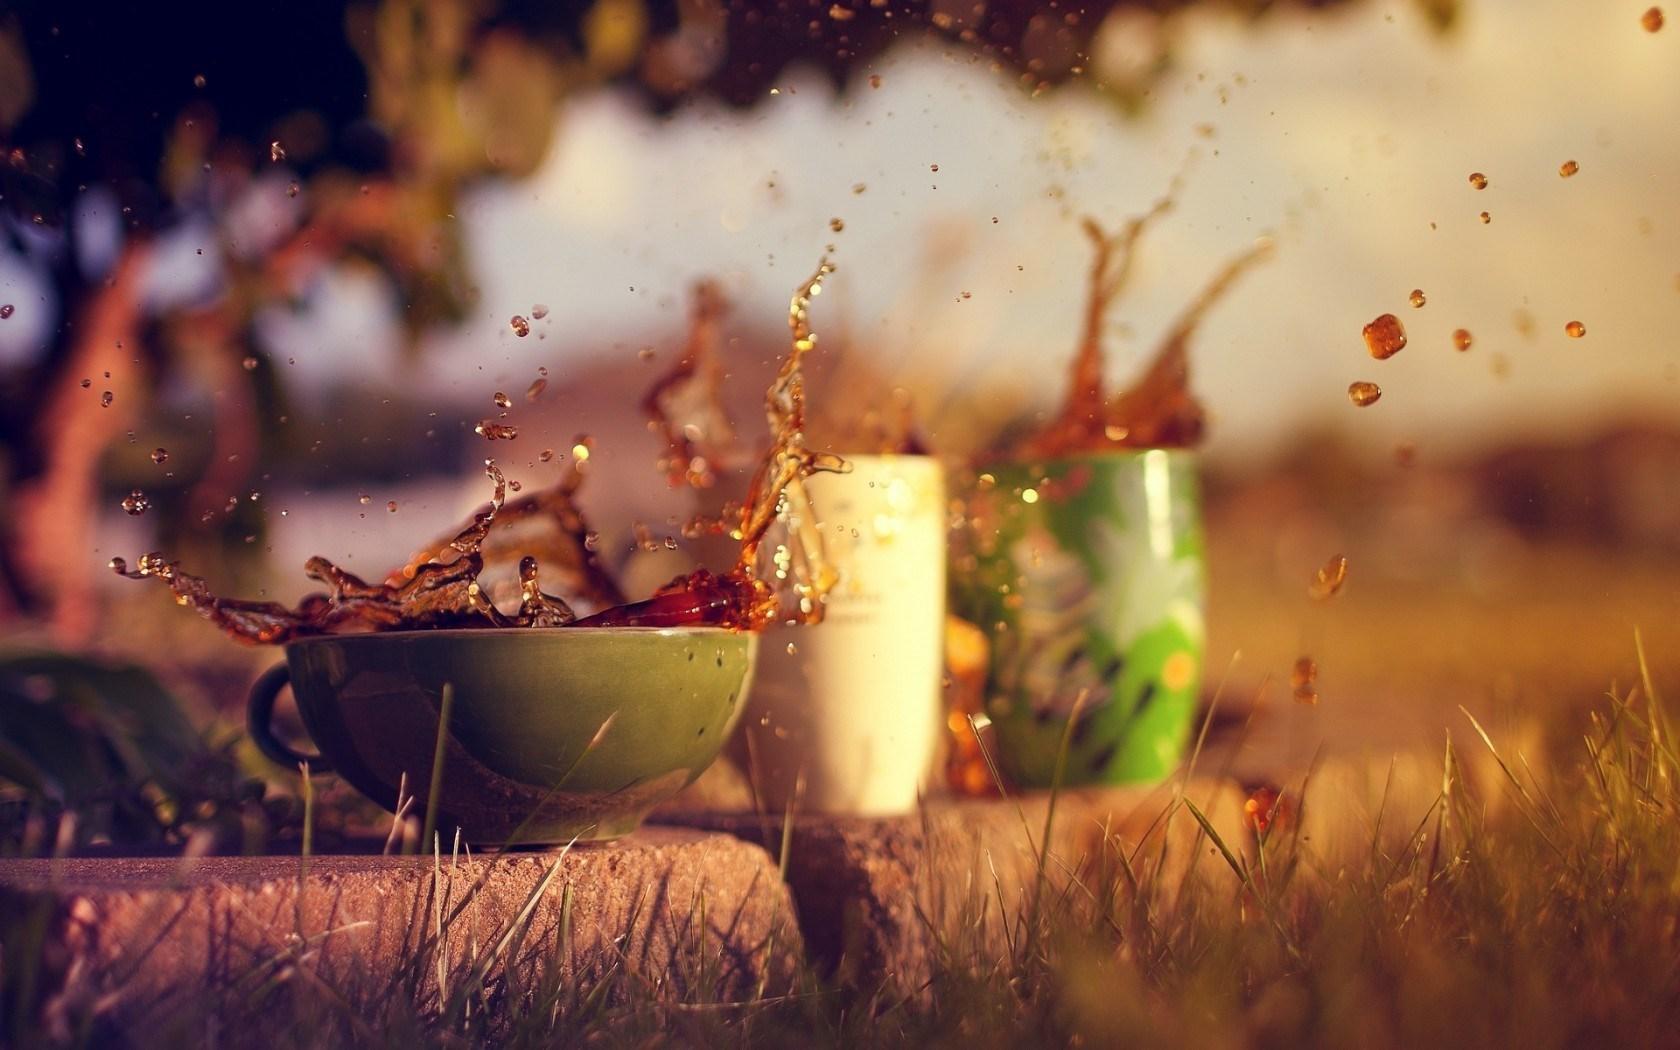 drink splash pictures 39413